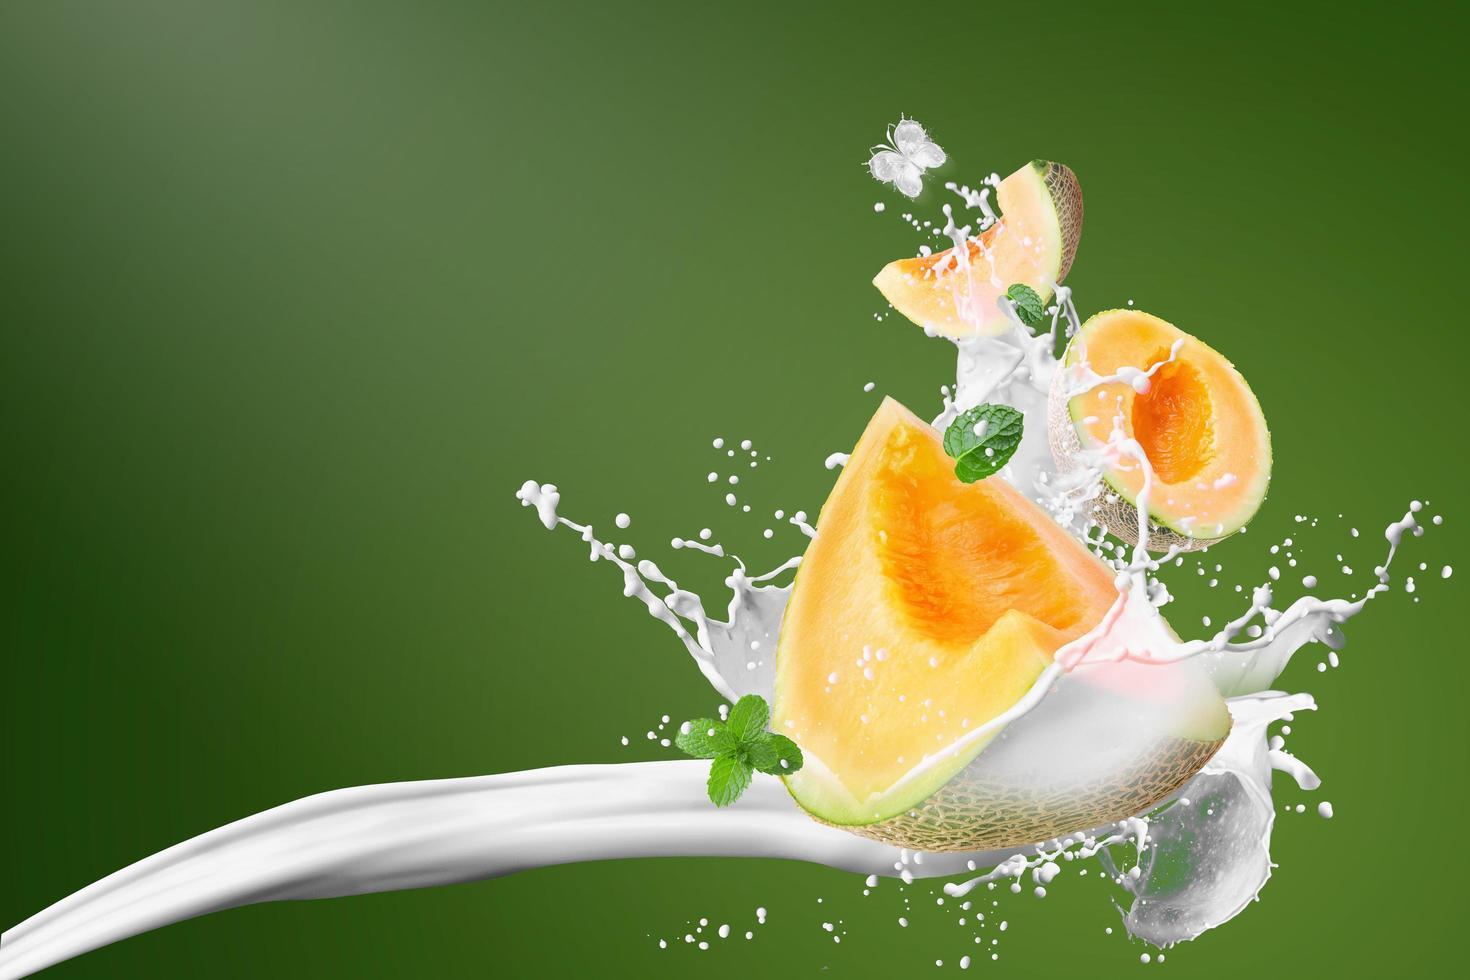 Japanese melons and milk splashing photo